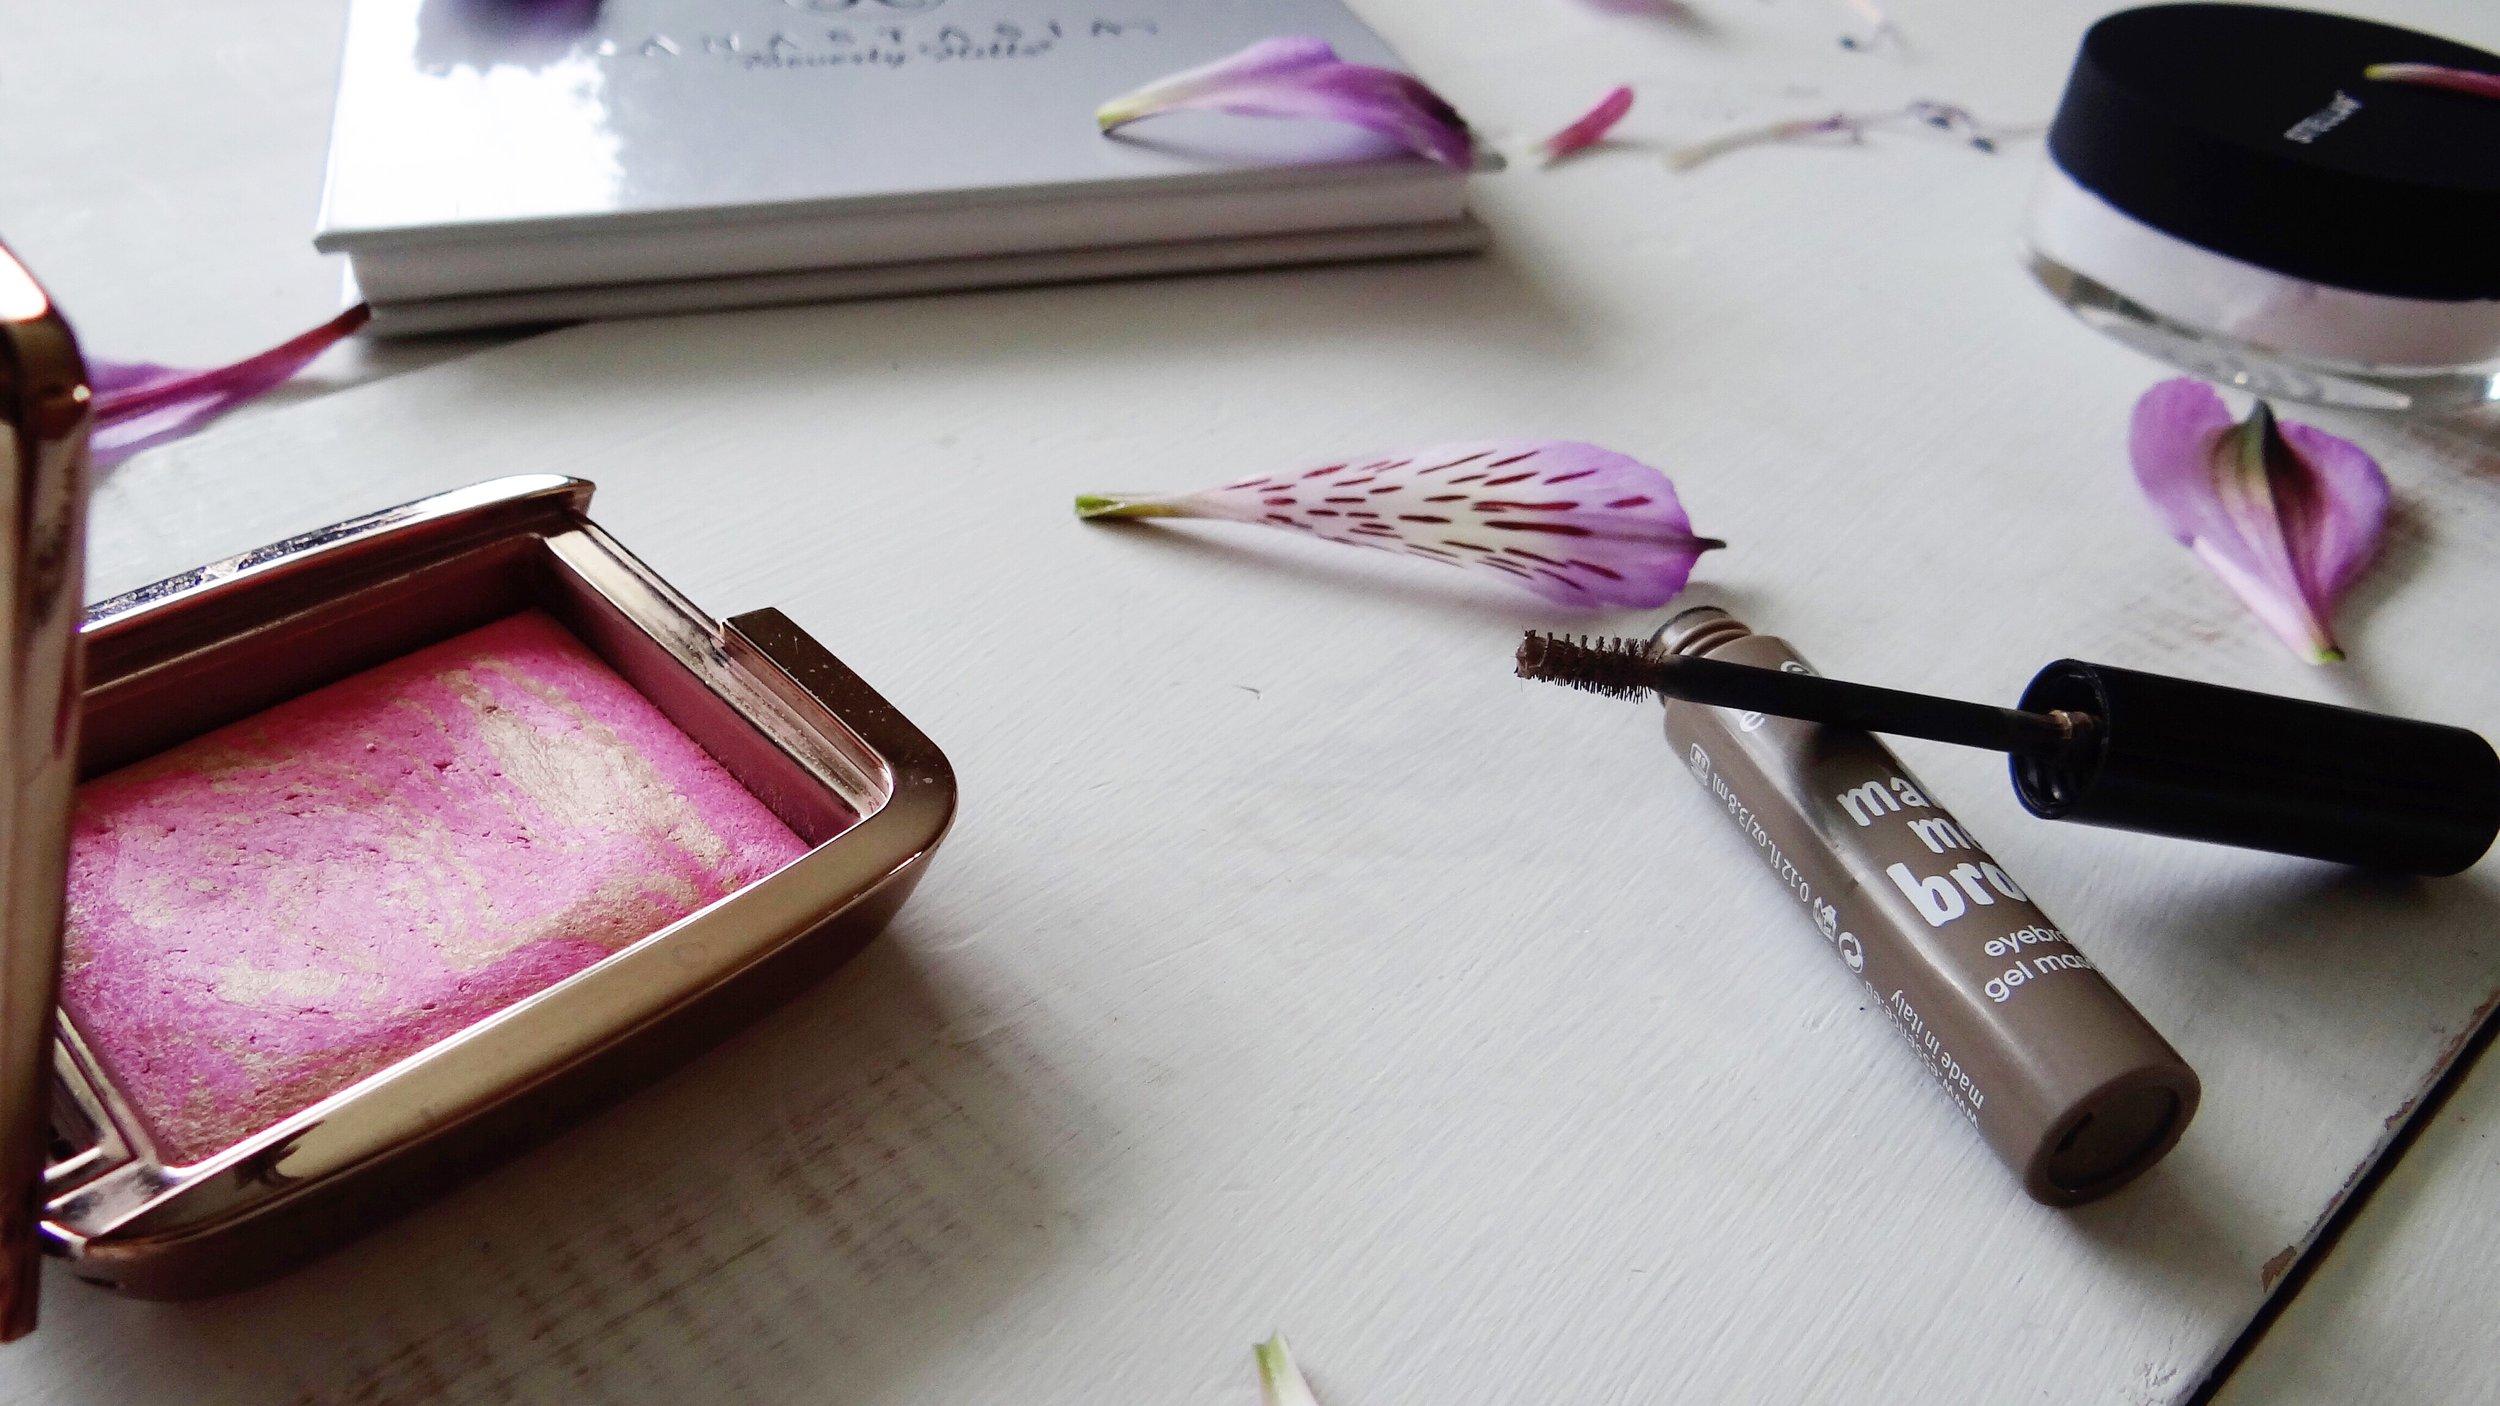 Minimalist & Cruelty-Free Makeup Routine - Artistry by Jacquie, Ottawa Makeup Artist (Stellar Cosmetics, Anastasia Beverly Hills, Hourglass Cosmetics & Essence Cosmetics)